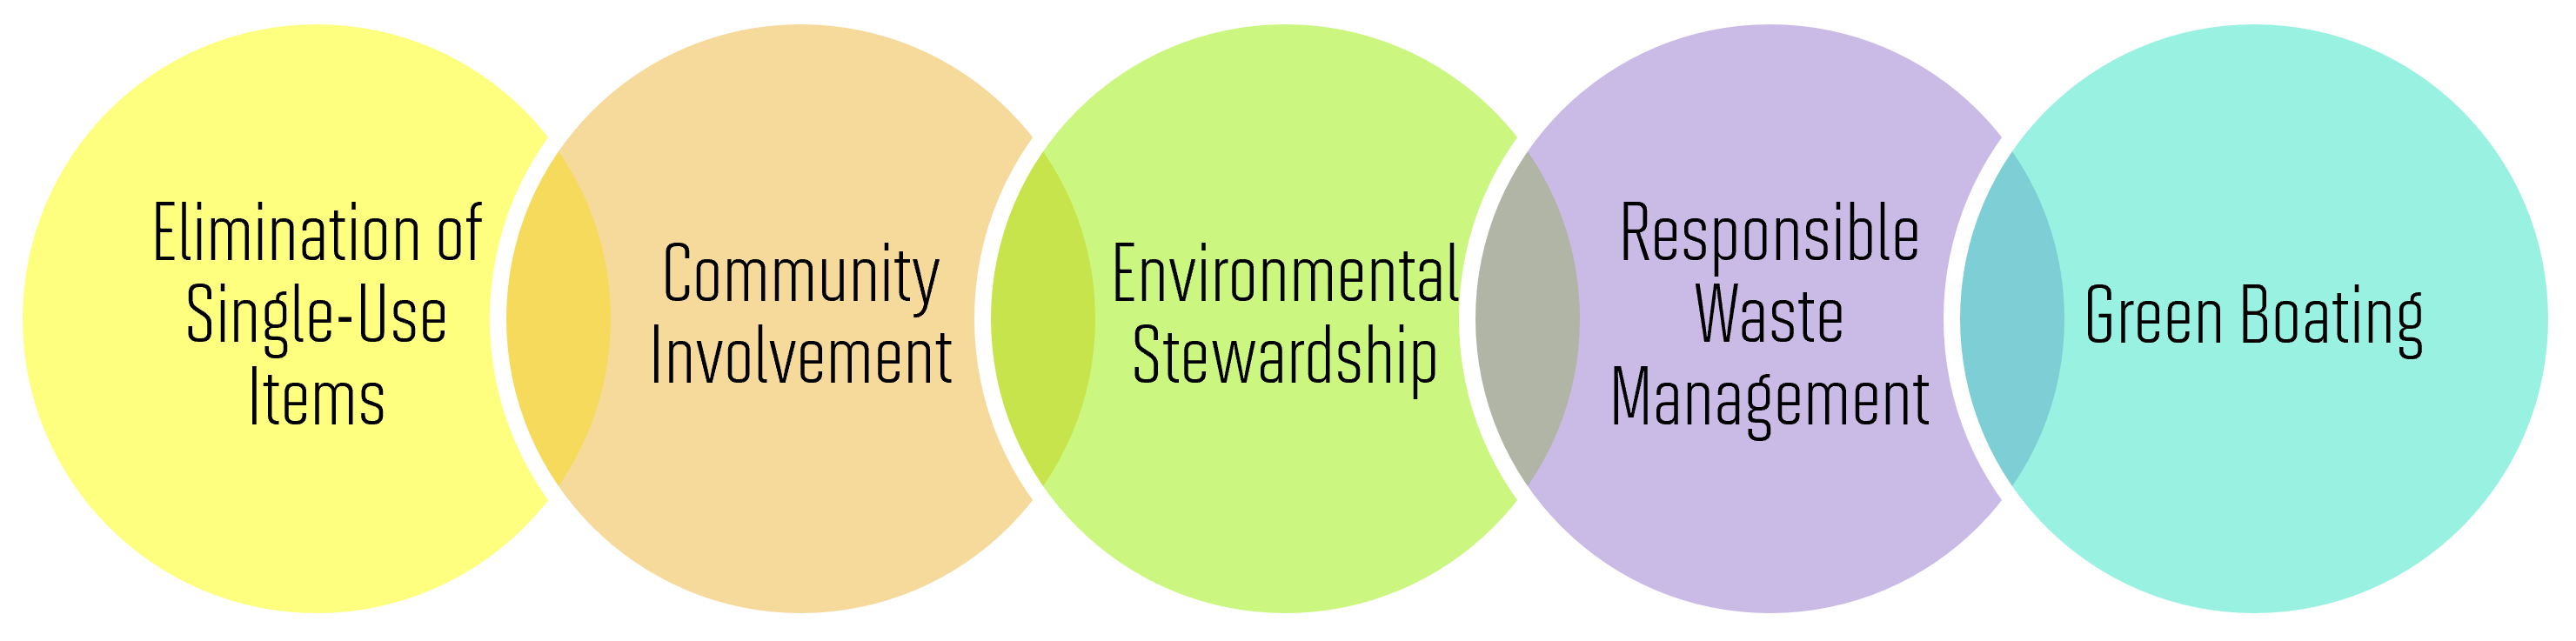 sustainability, themes, clean regattas